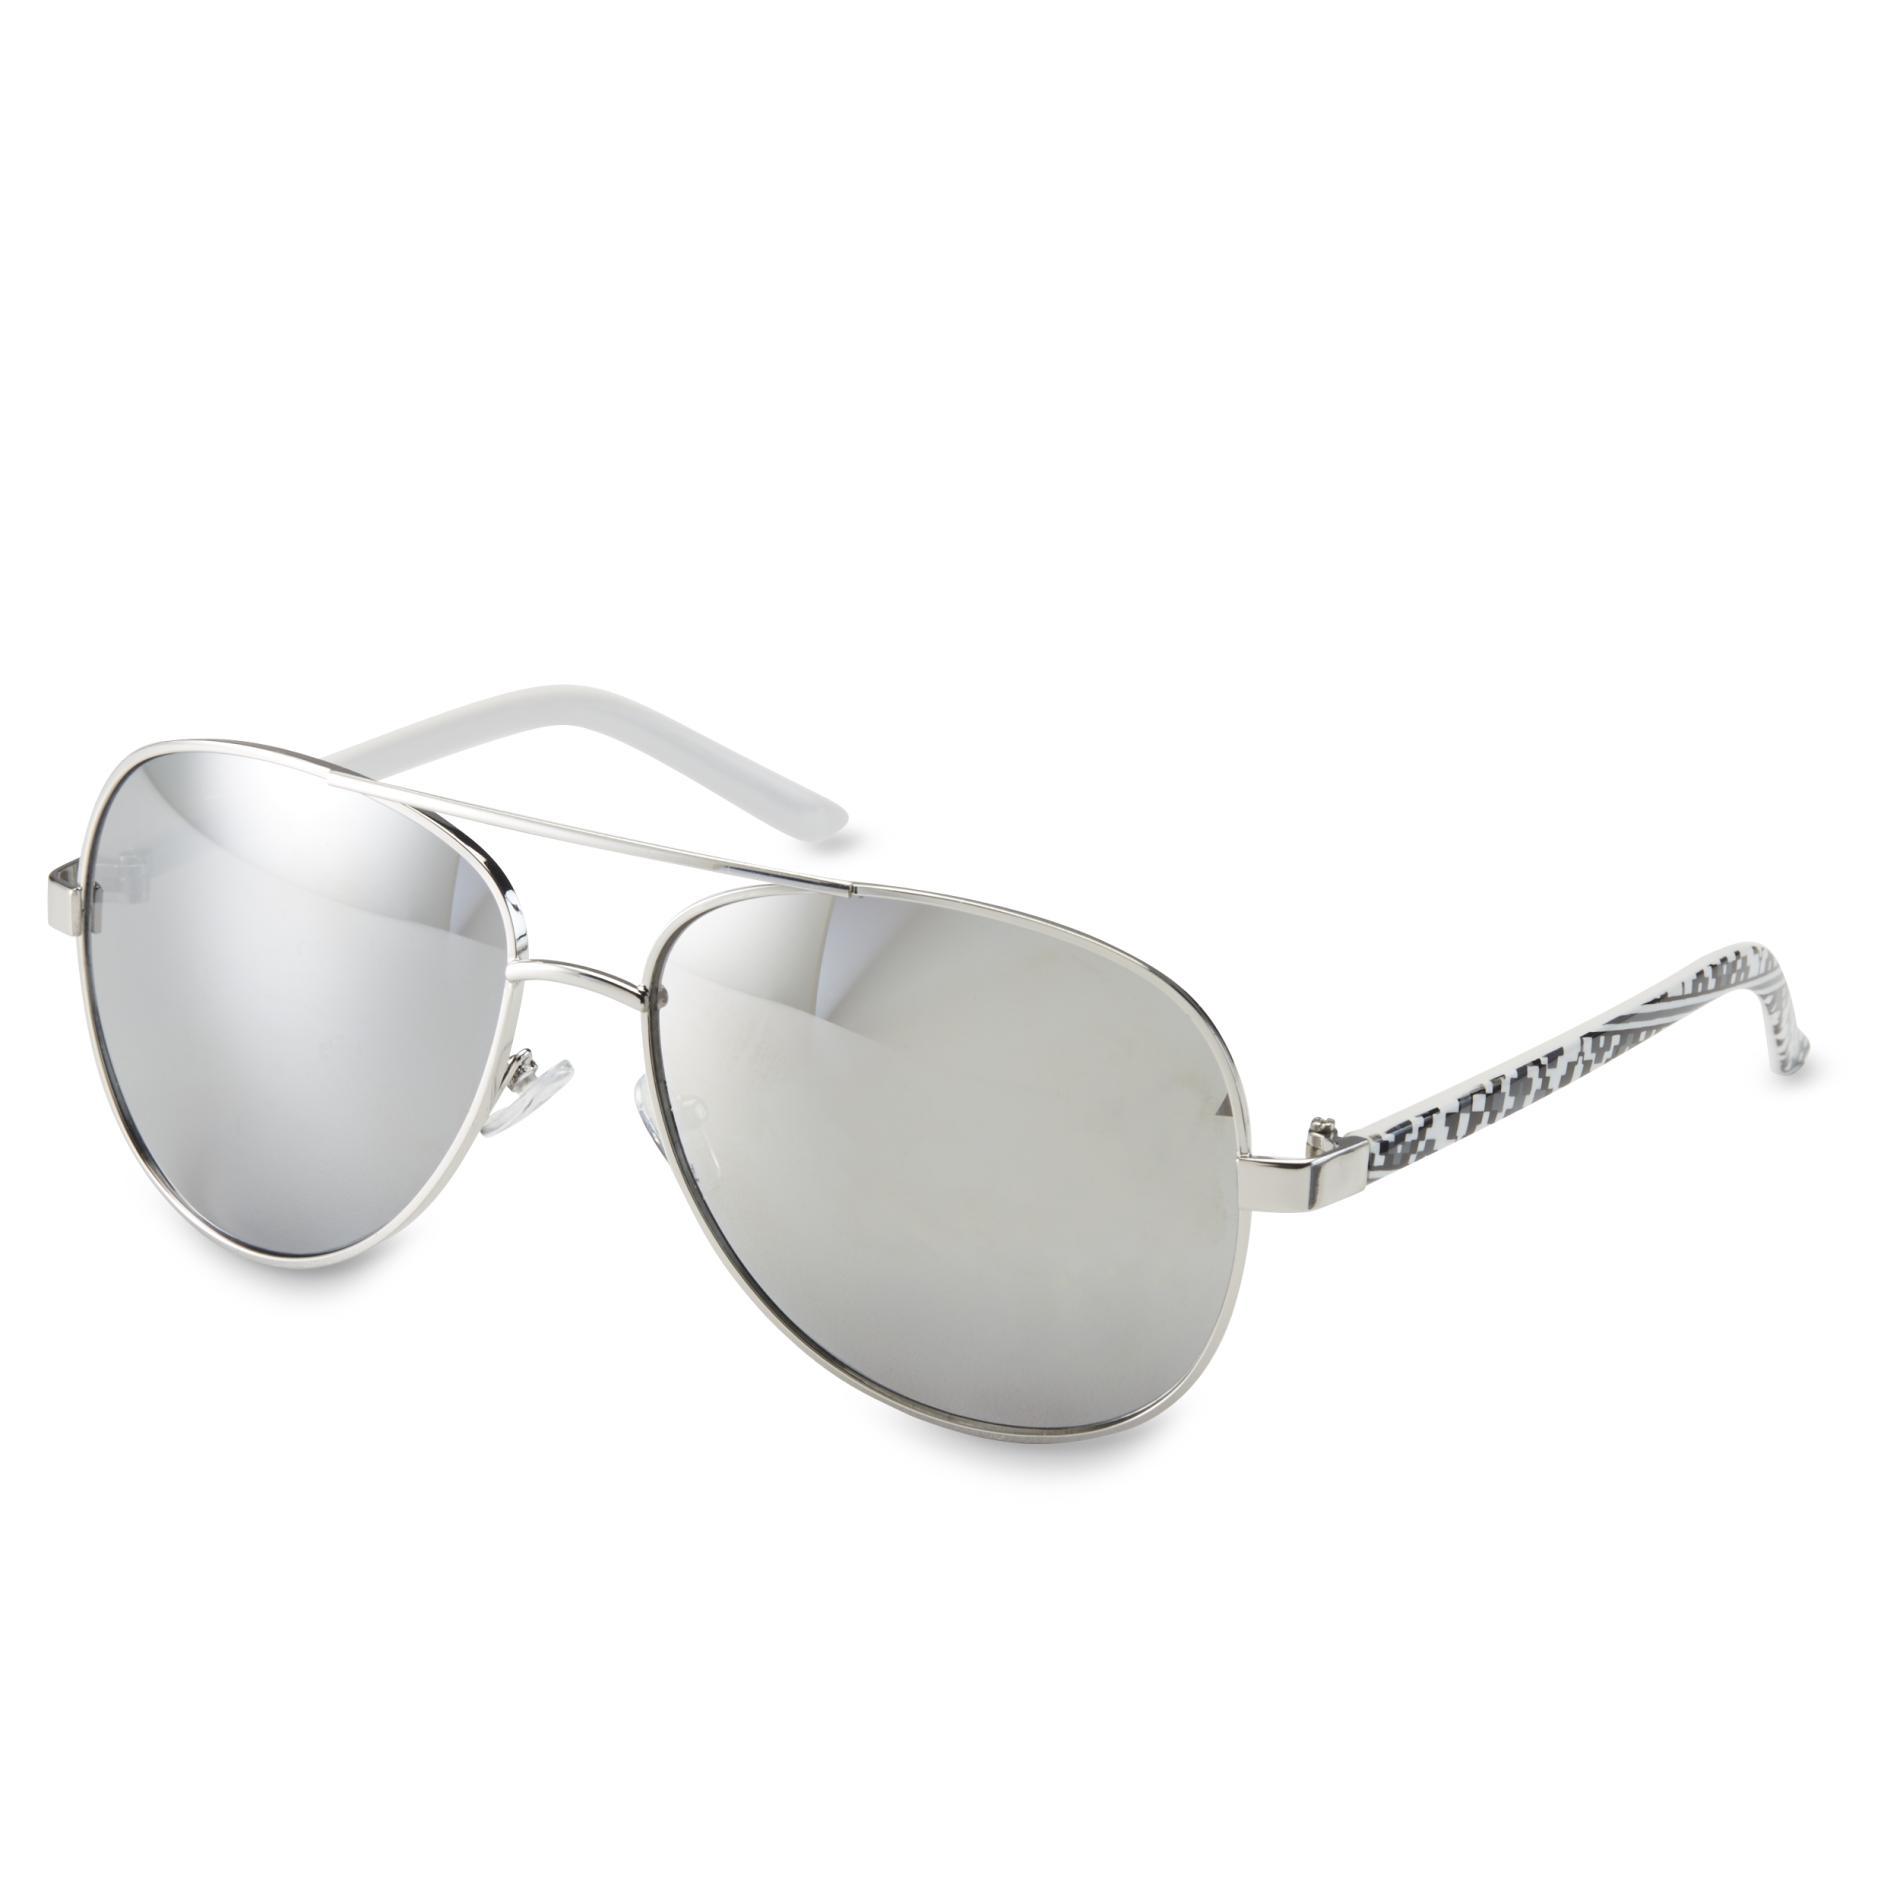 Joe Boxer Silvertone/Tribal Aviator Sunglasses